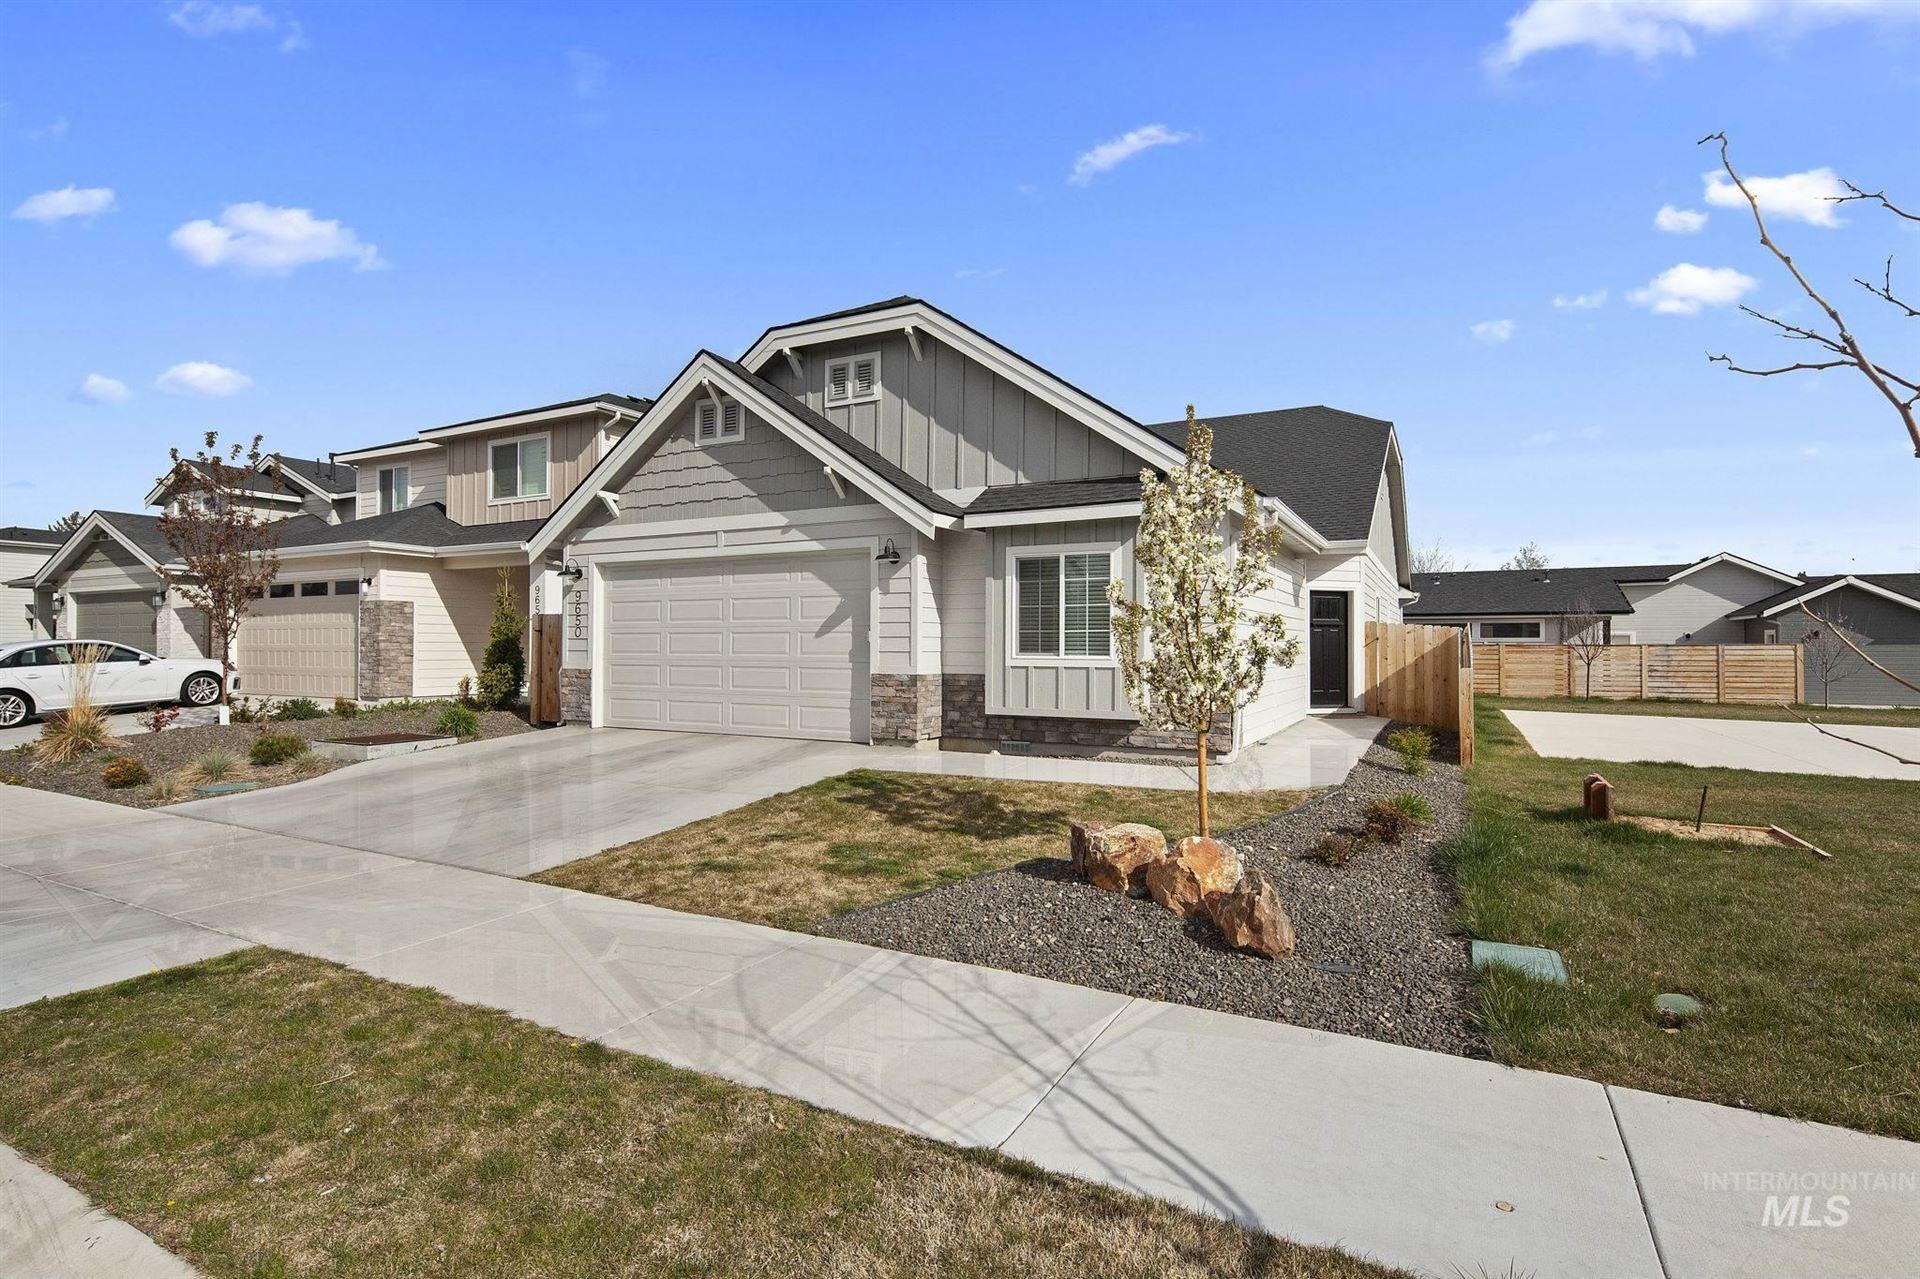 Photo of 9650 W Macaw, Boise, ID 83704 (MLS # 98799804)